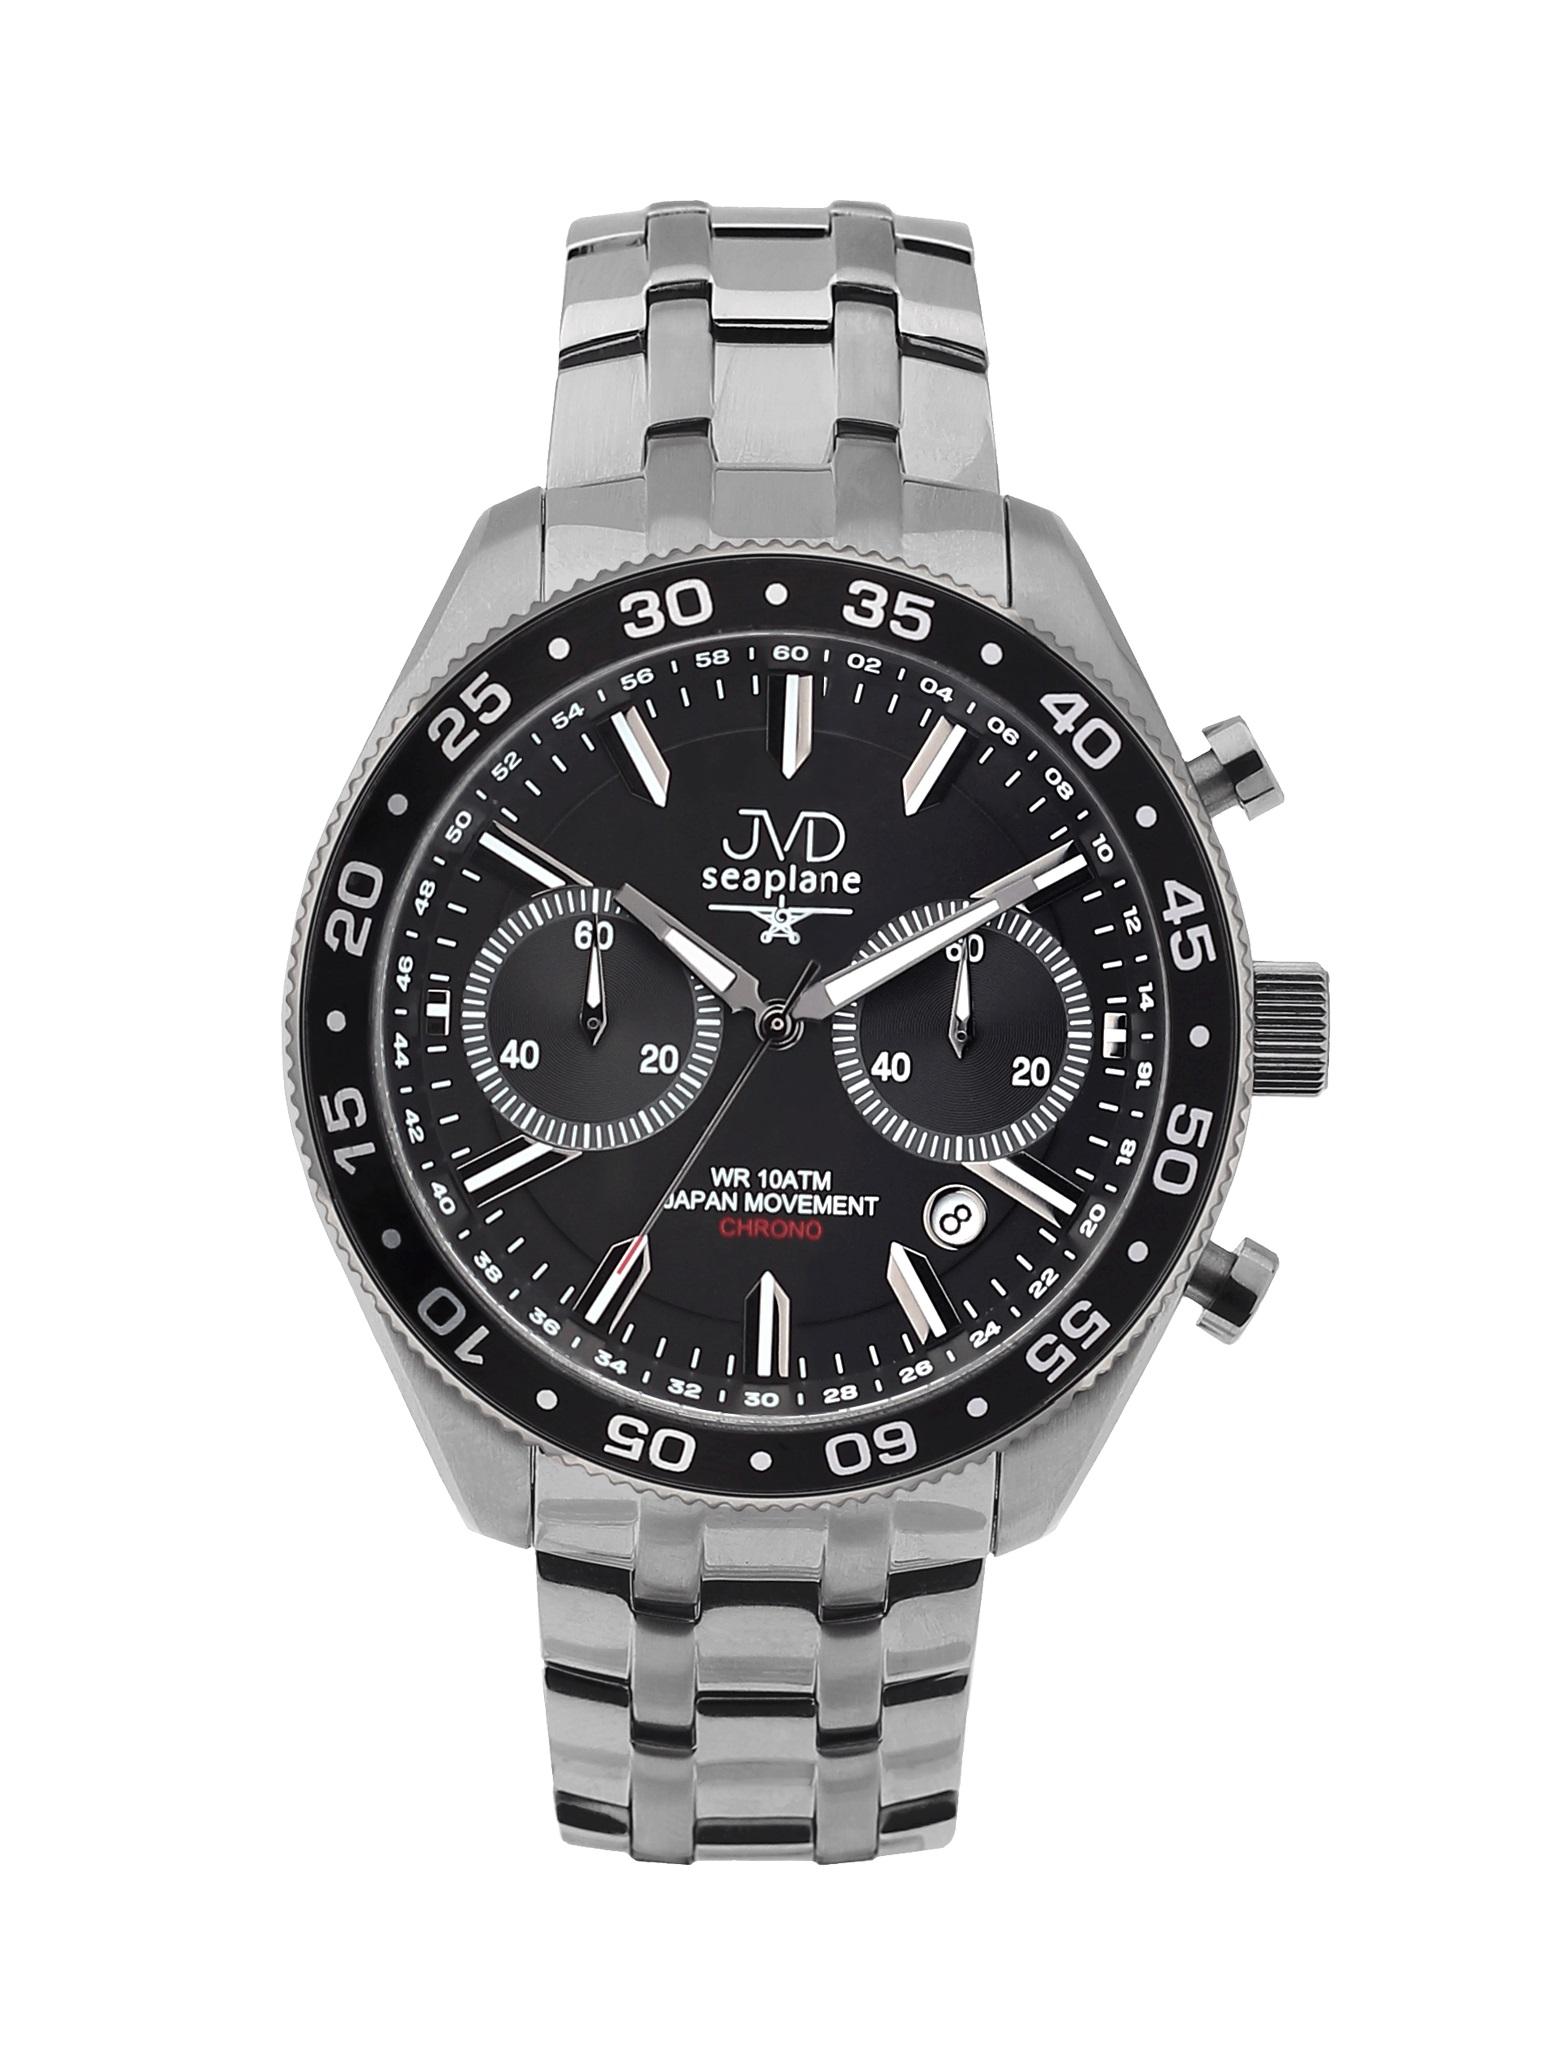 Pánské vodotěsné odolné náramkové hodinky Seaplane INFUSION J1117.2 (POŠTOVNÉ ZDARMA!!)